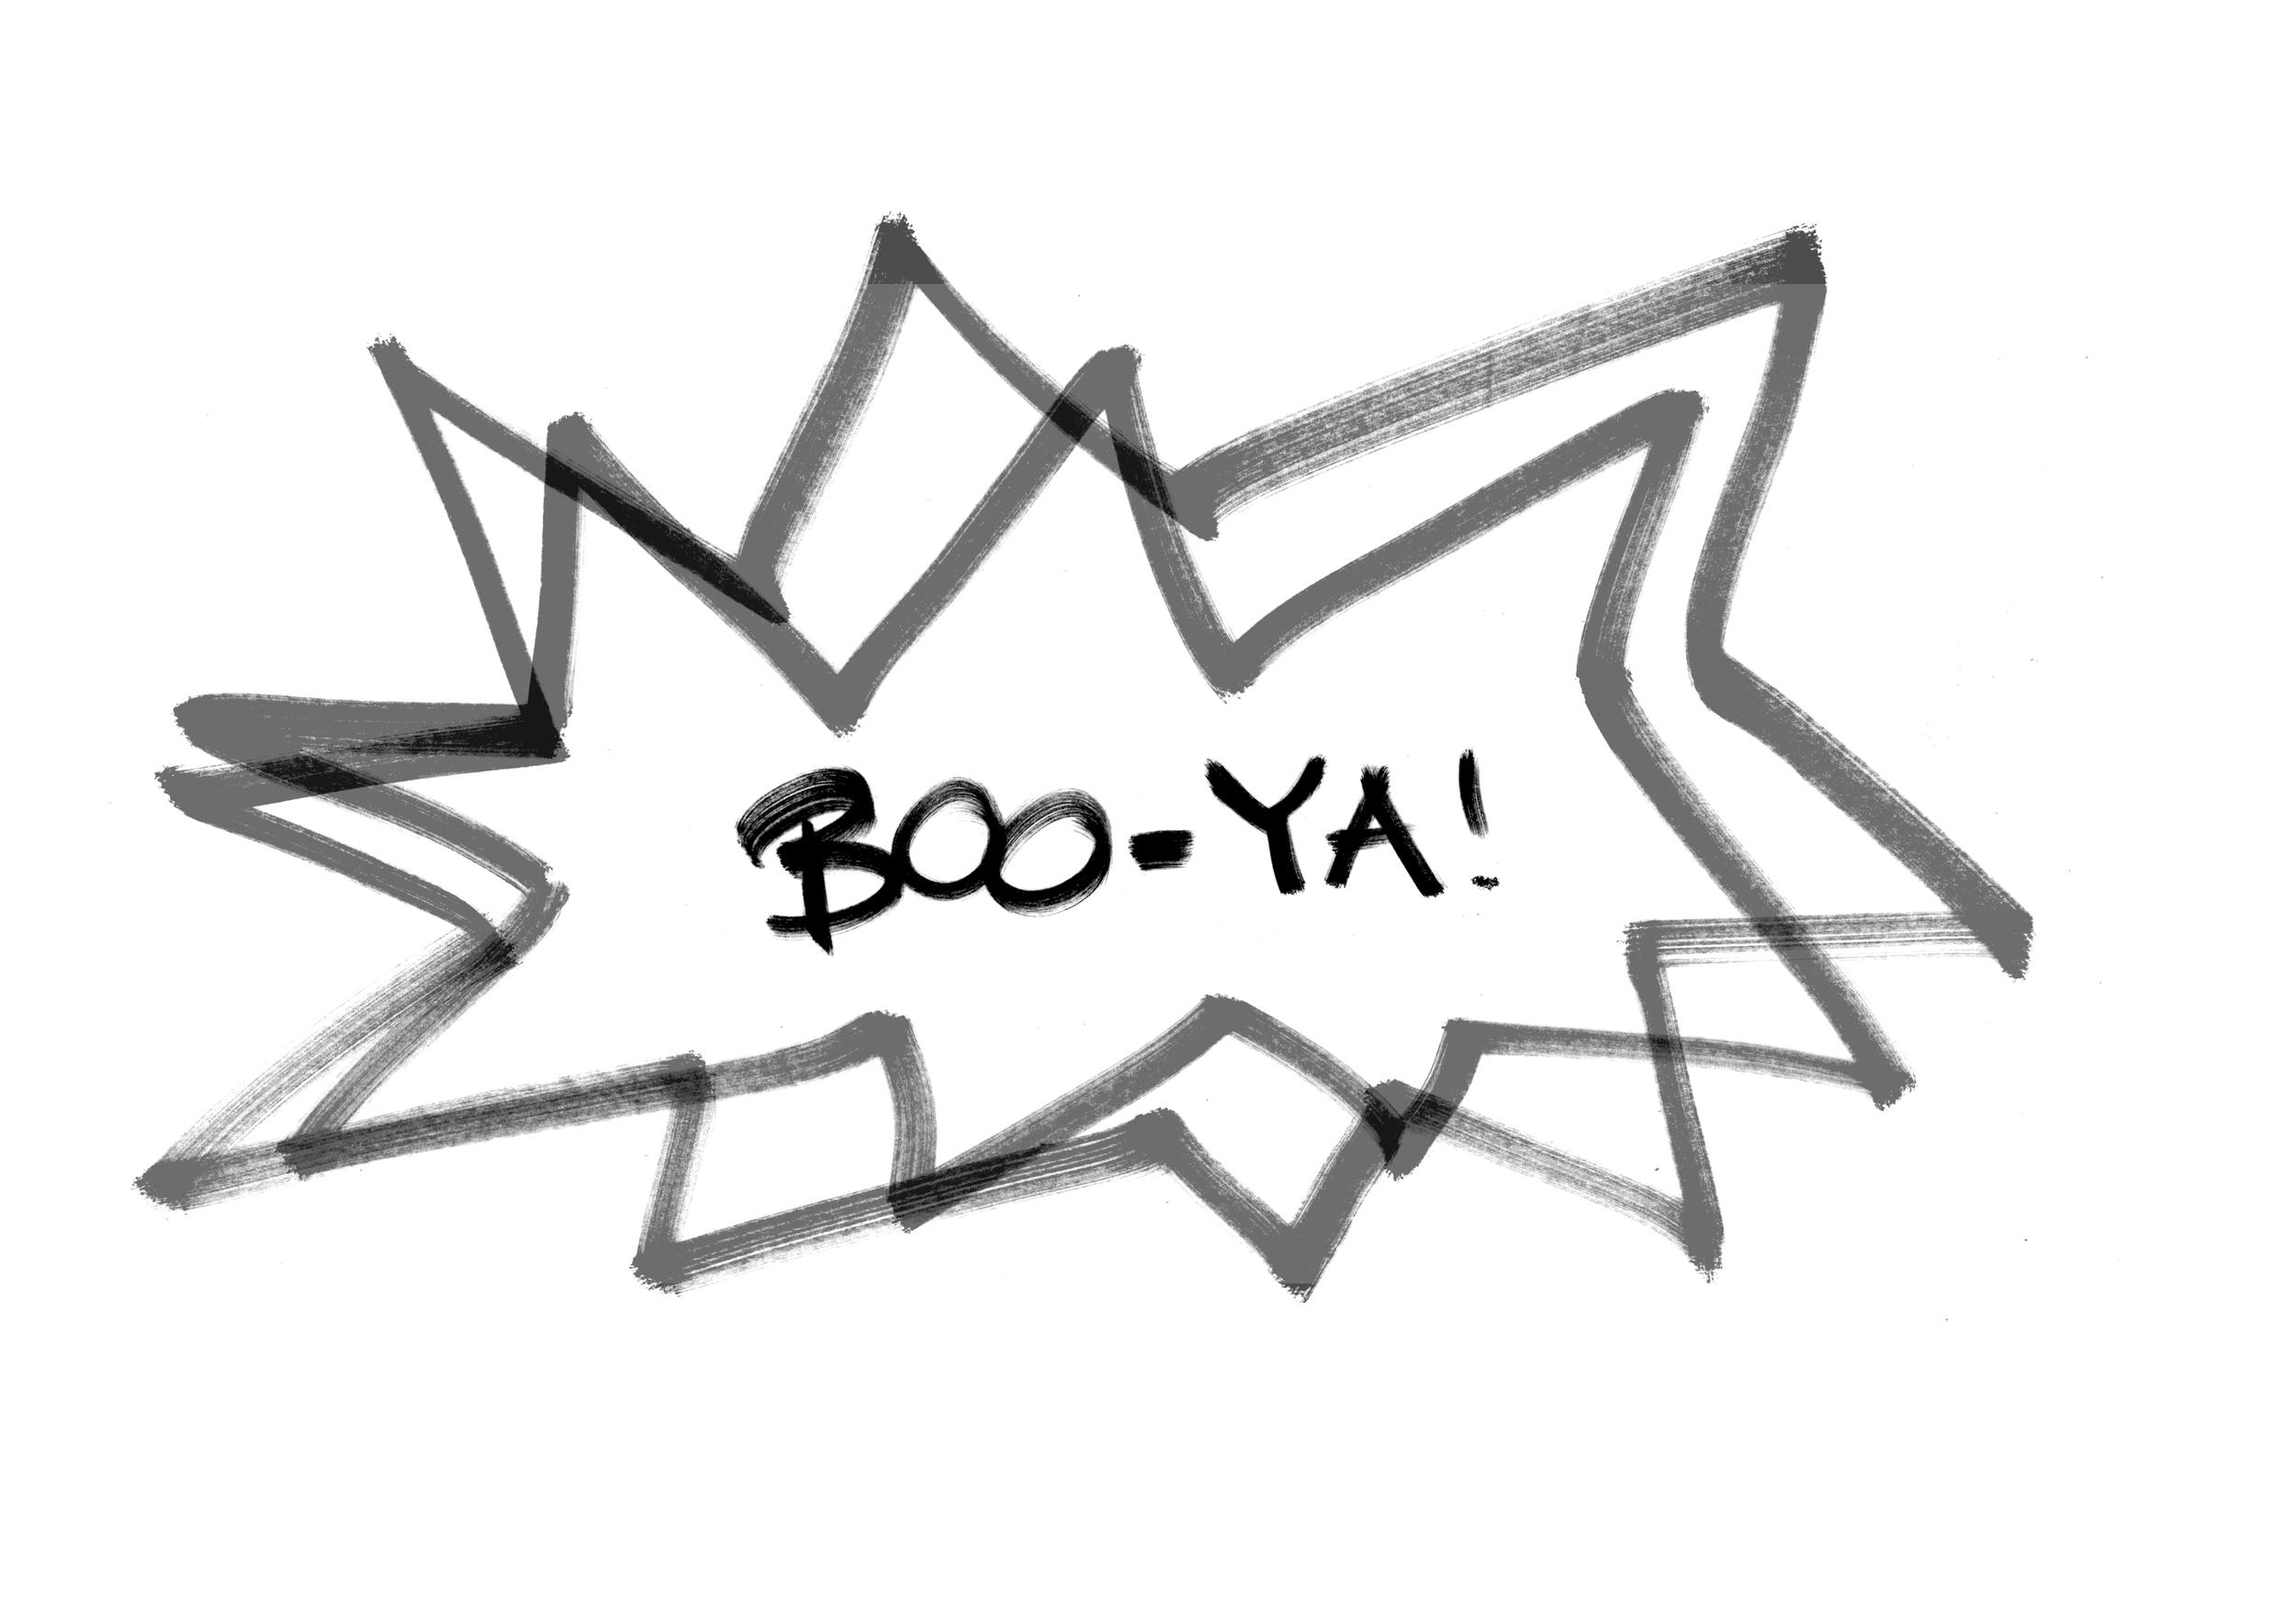 logo_bbo-ya.jpg